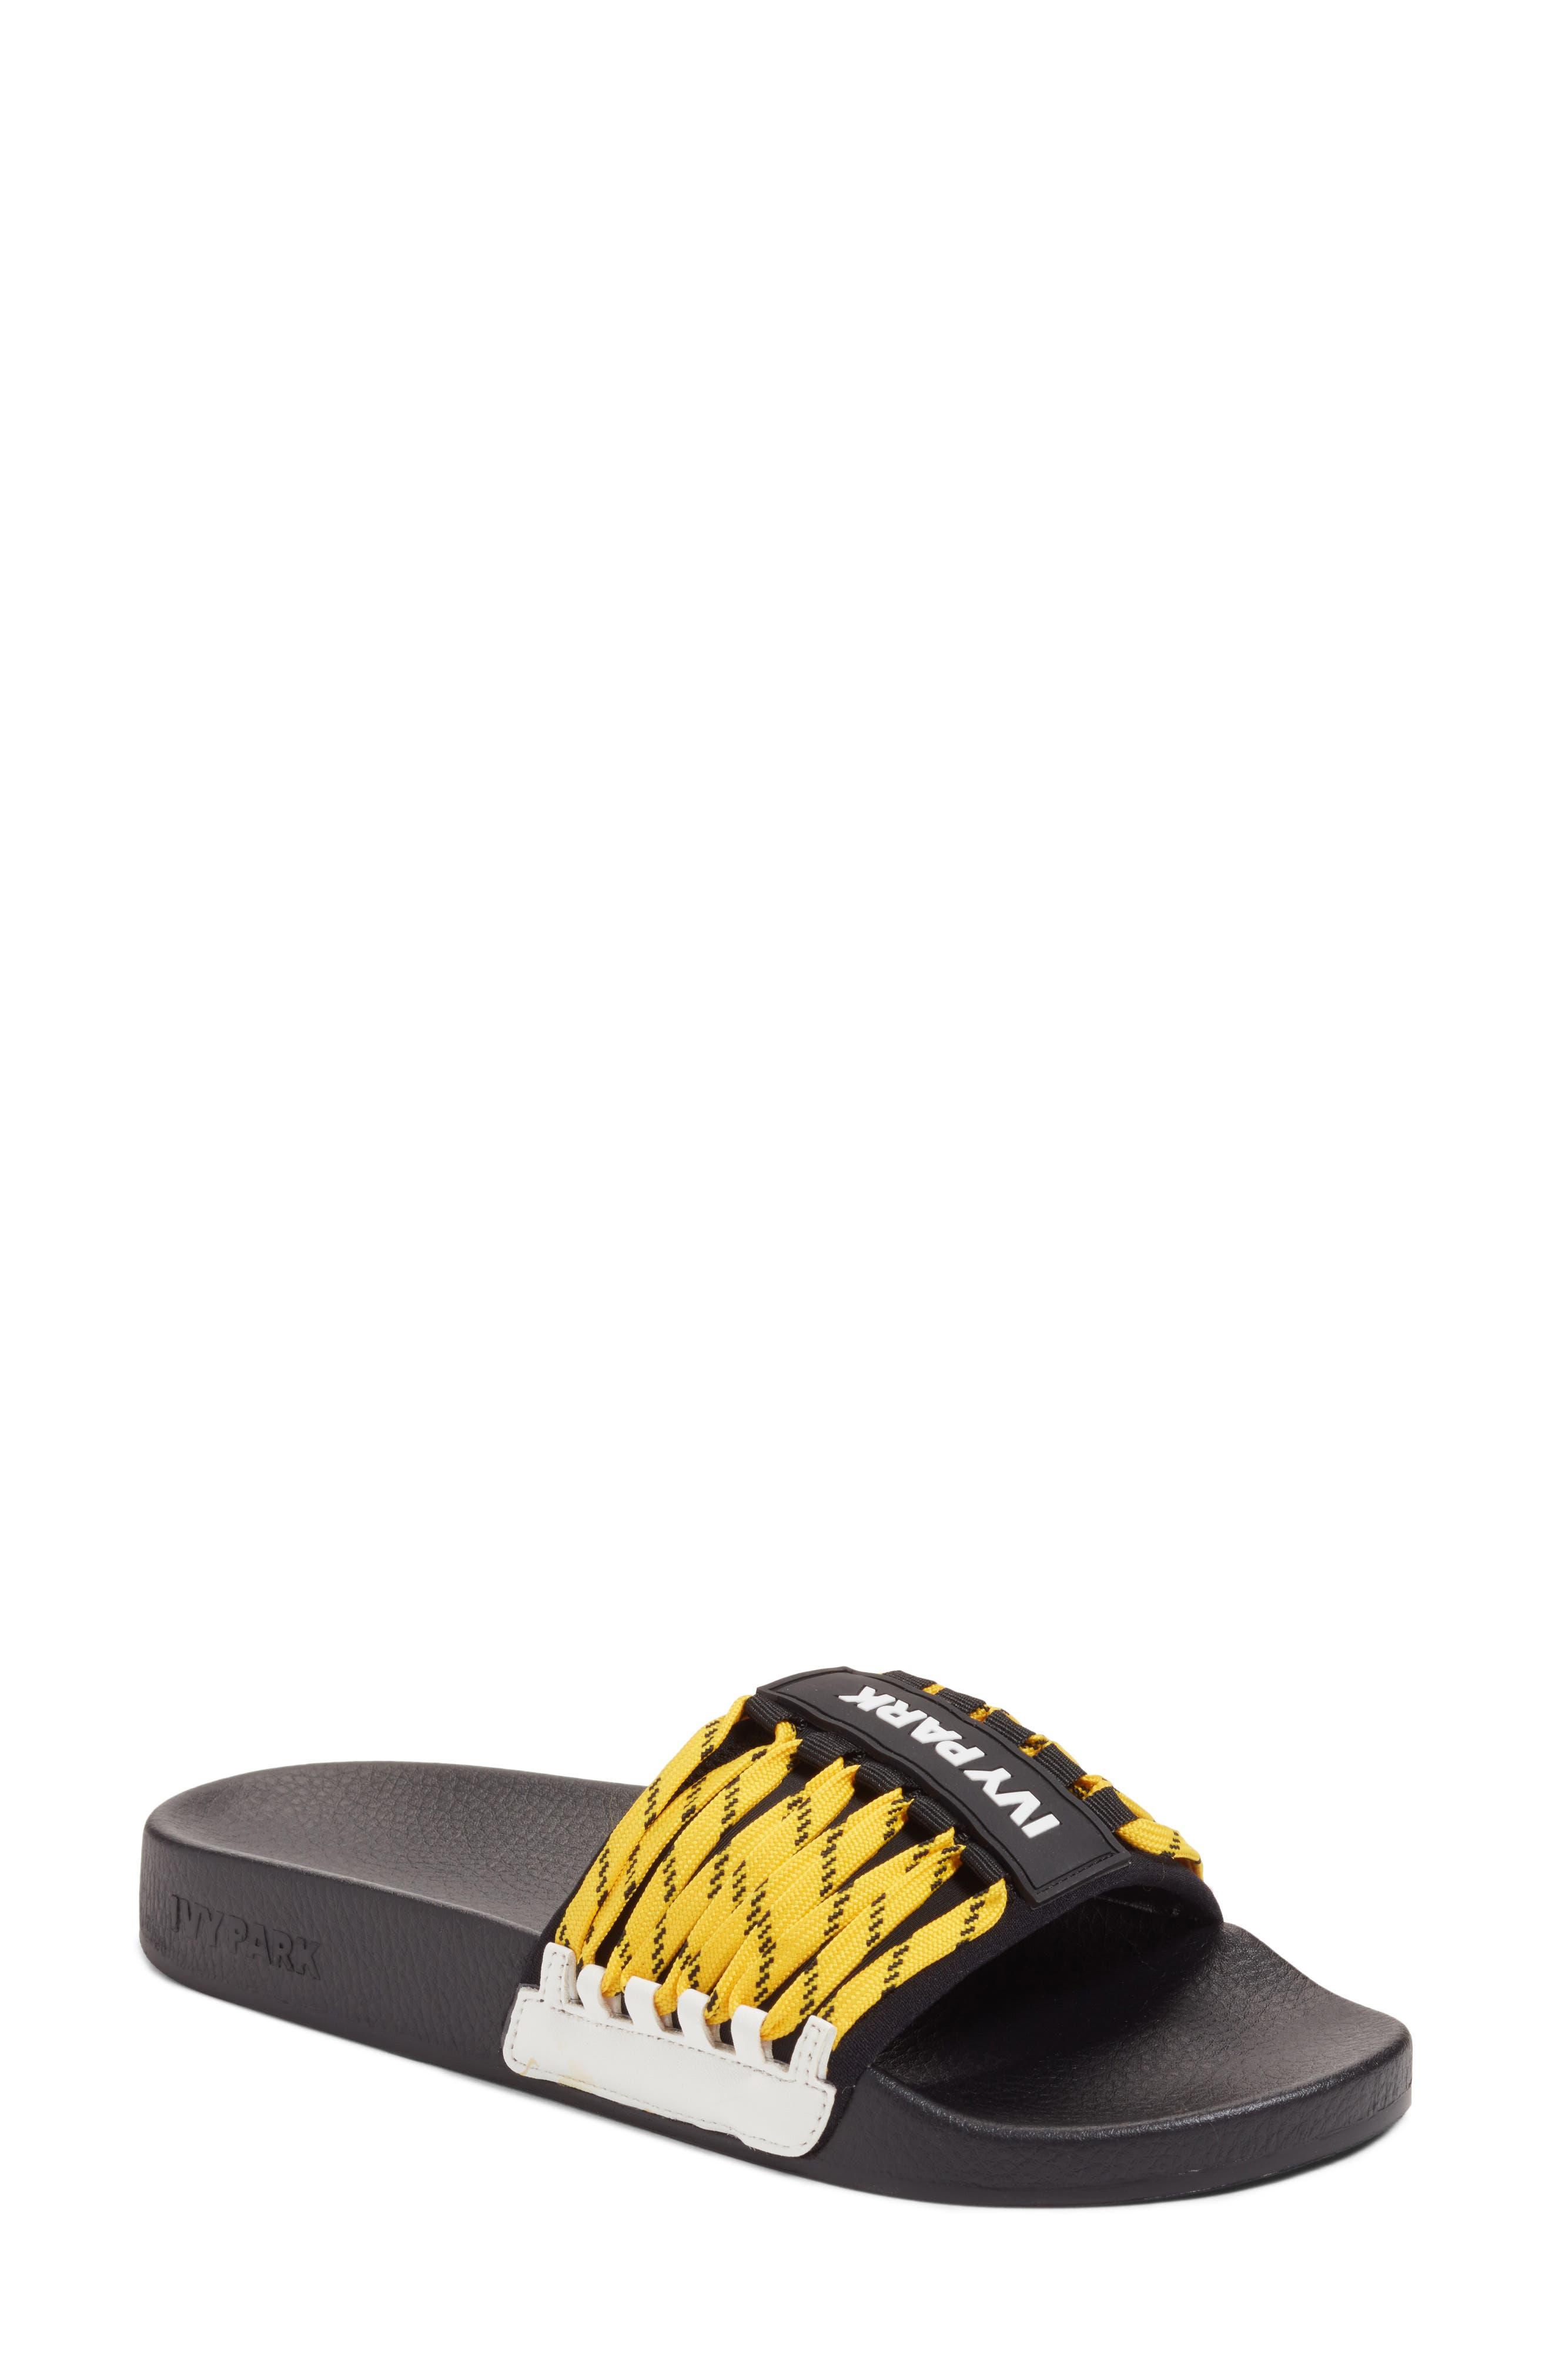 IVY PARK® Lace-Up Slide Sandal (Women)